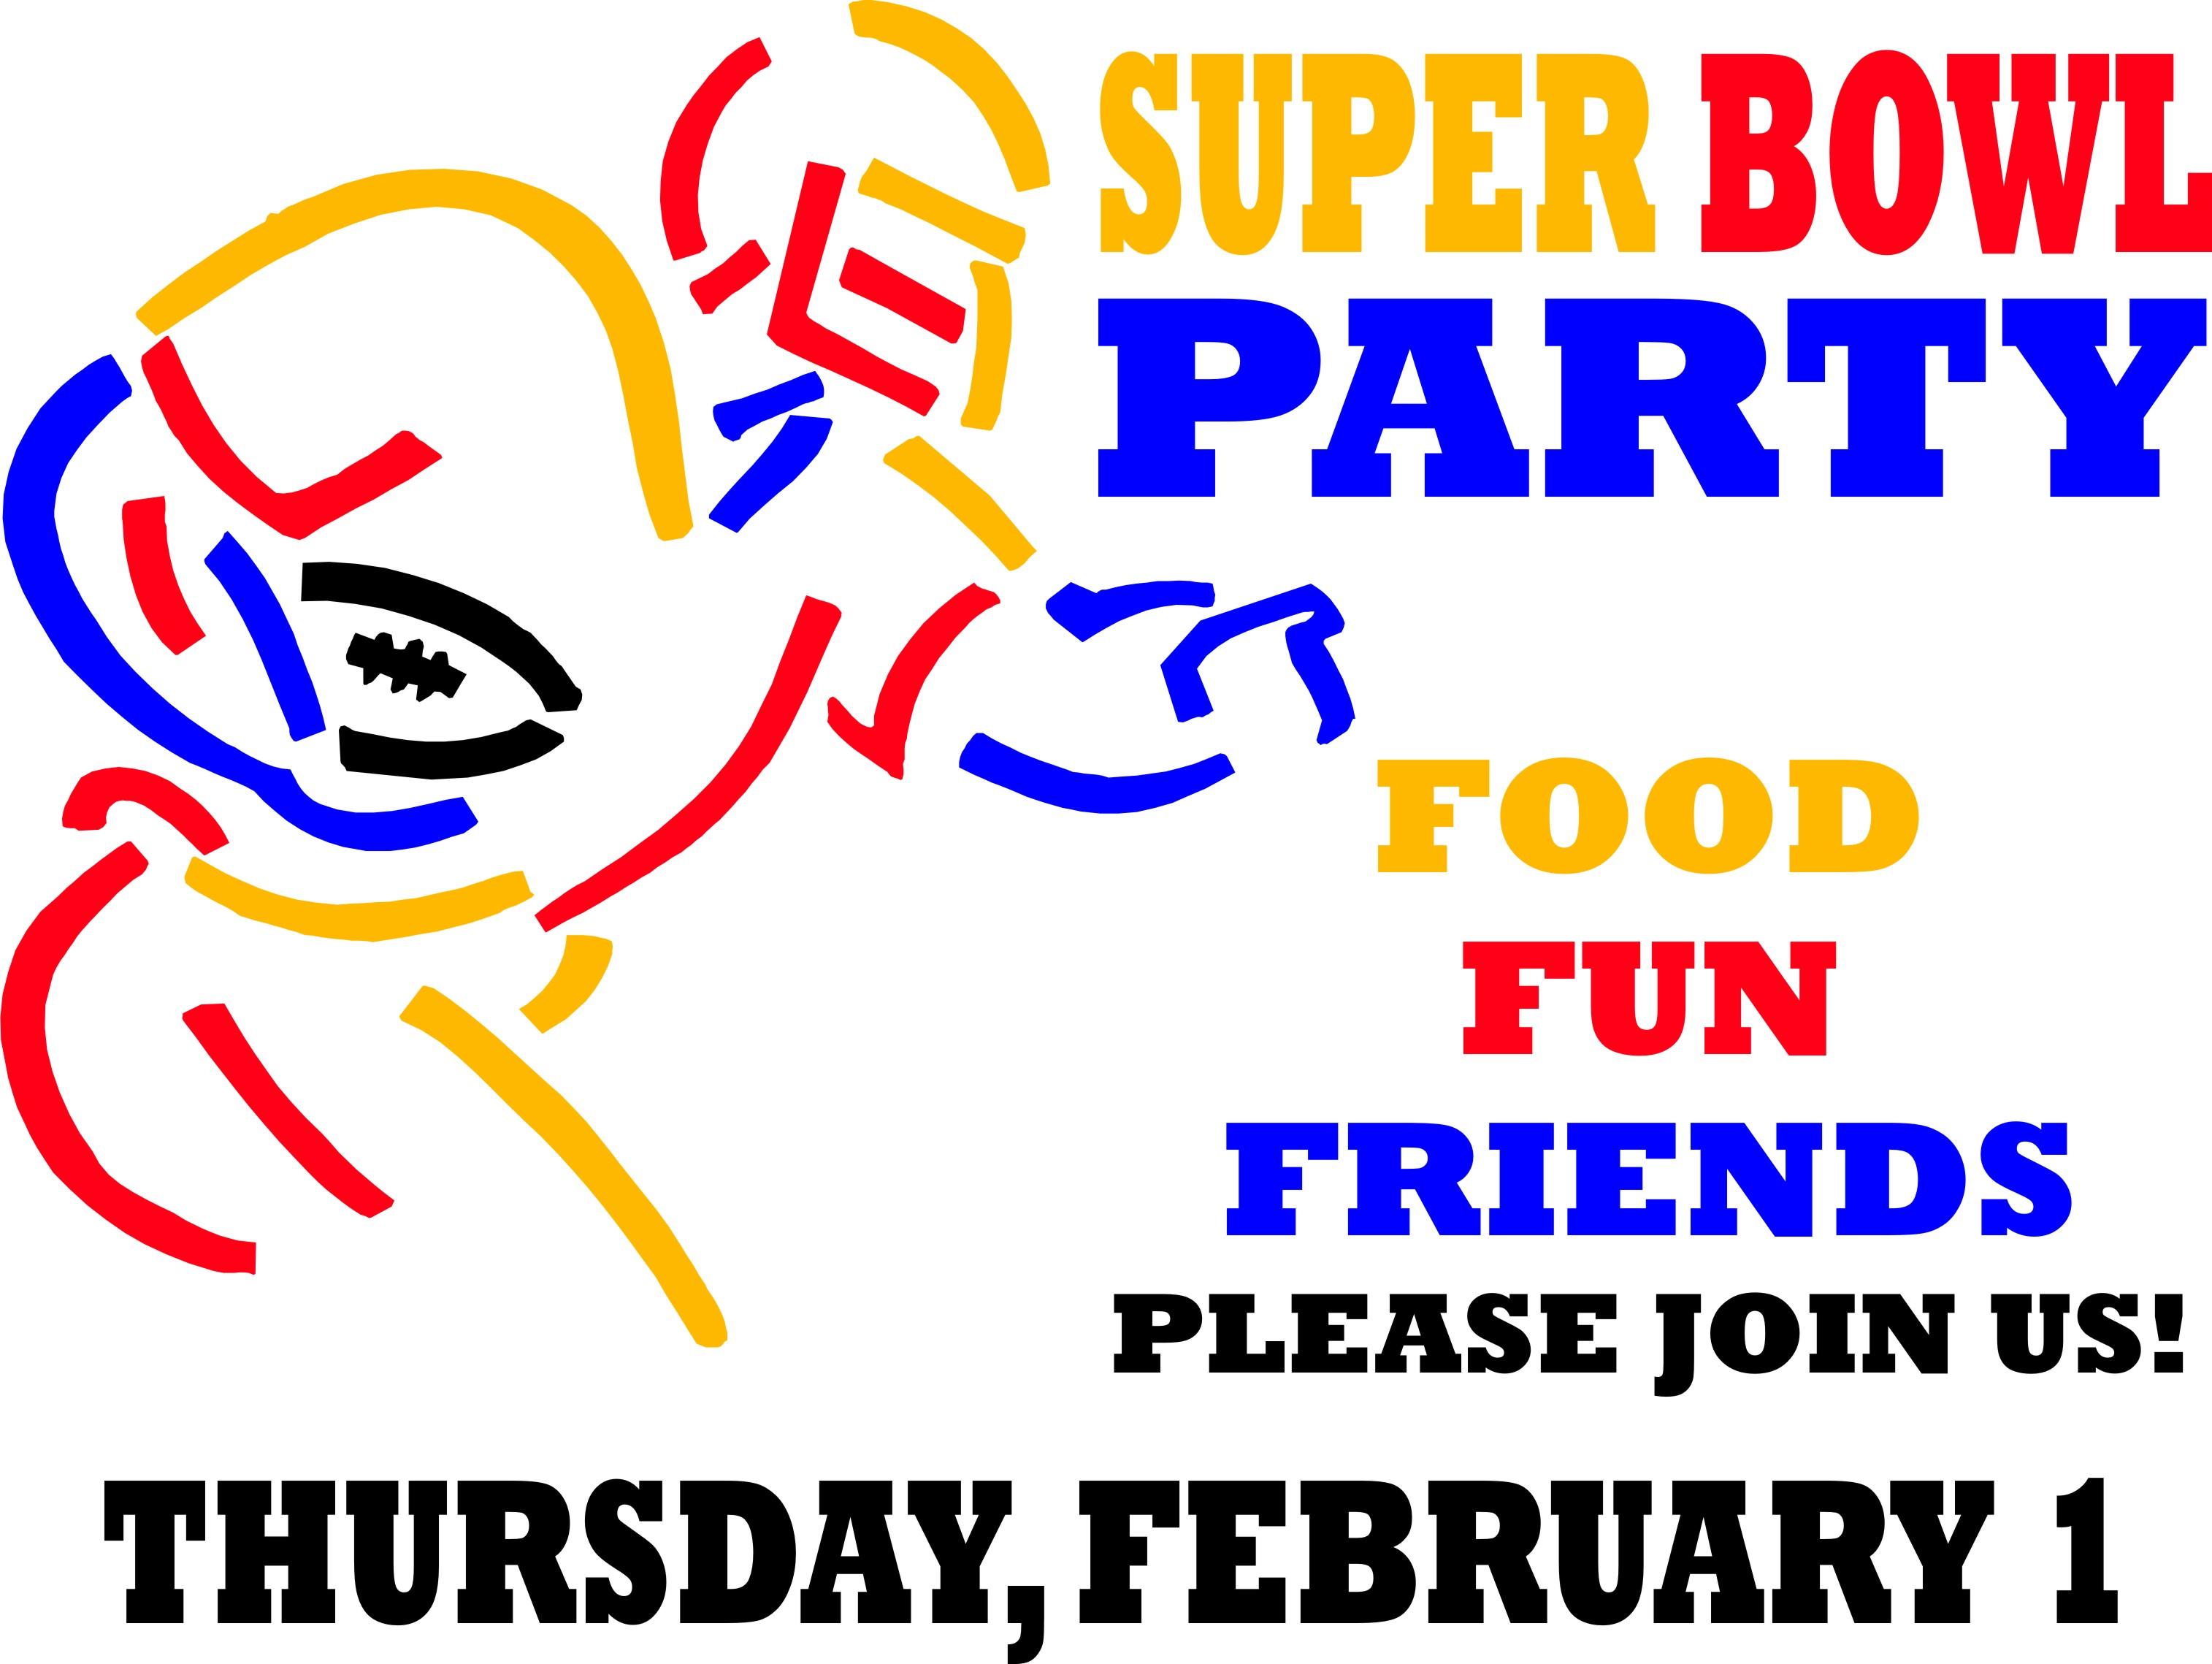 Free Super Bowl Cliparts, Download Free Clip Art, Free Clip Art on.